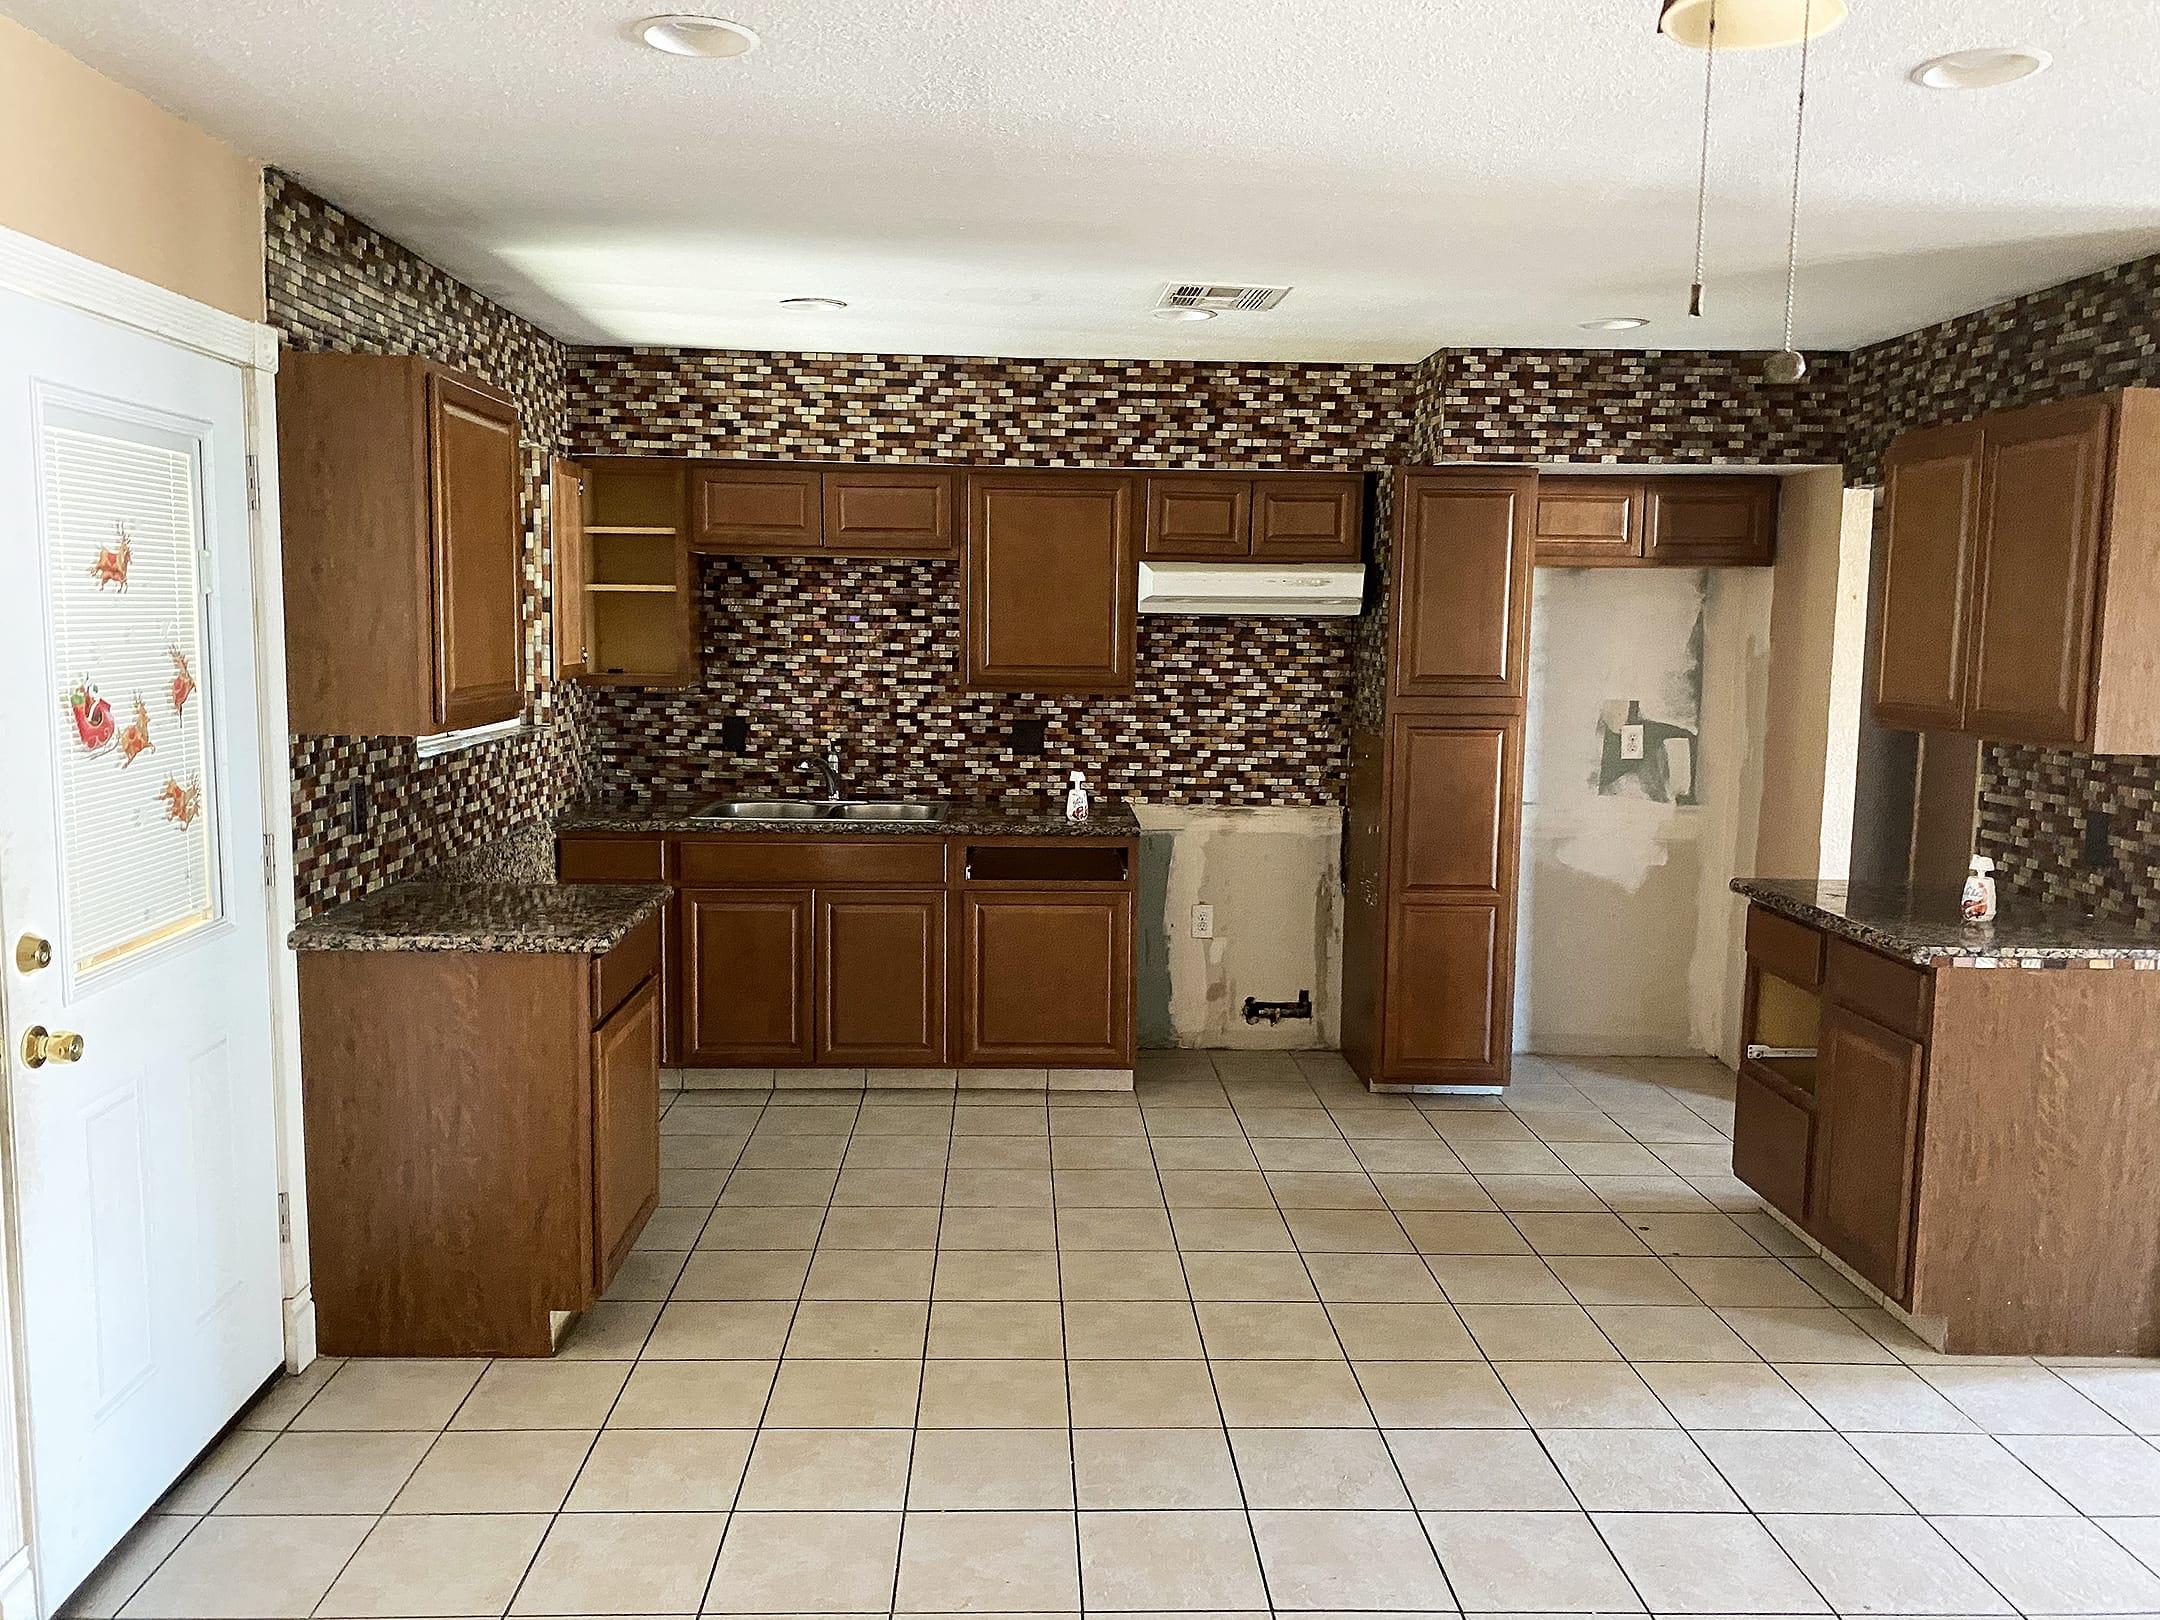 Earll_Kitchen